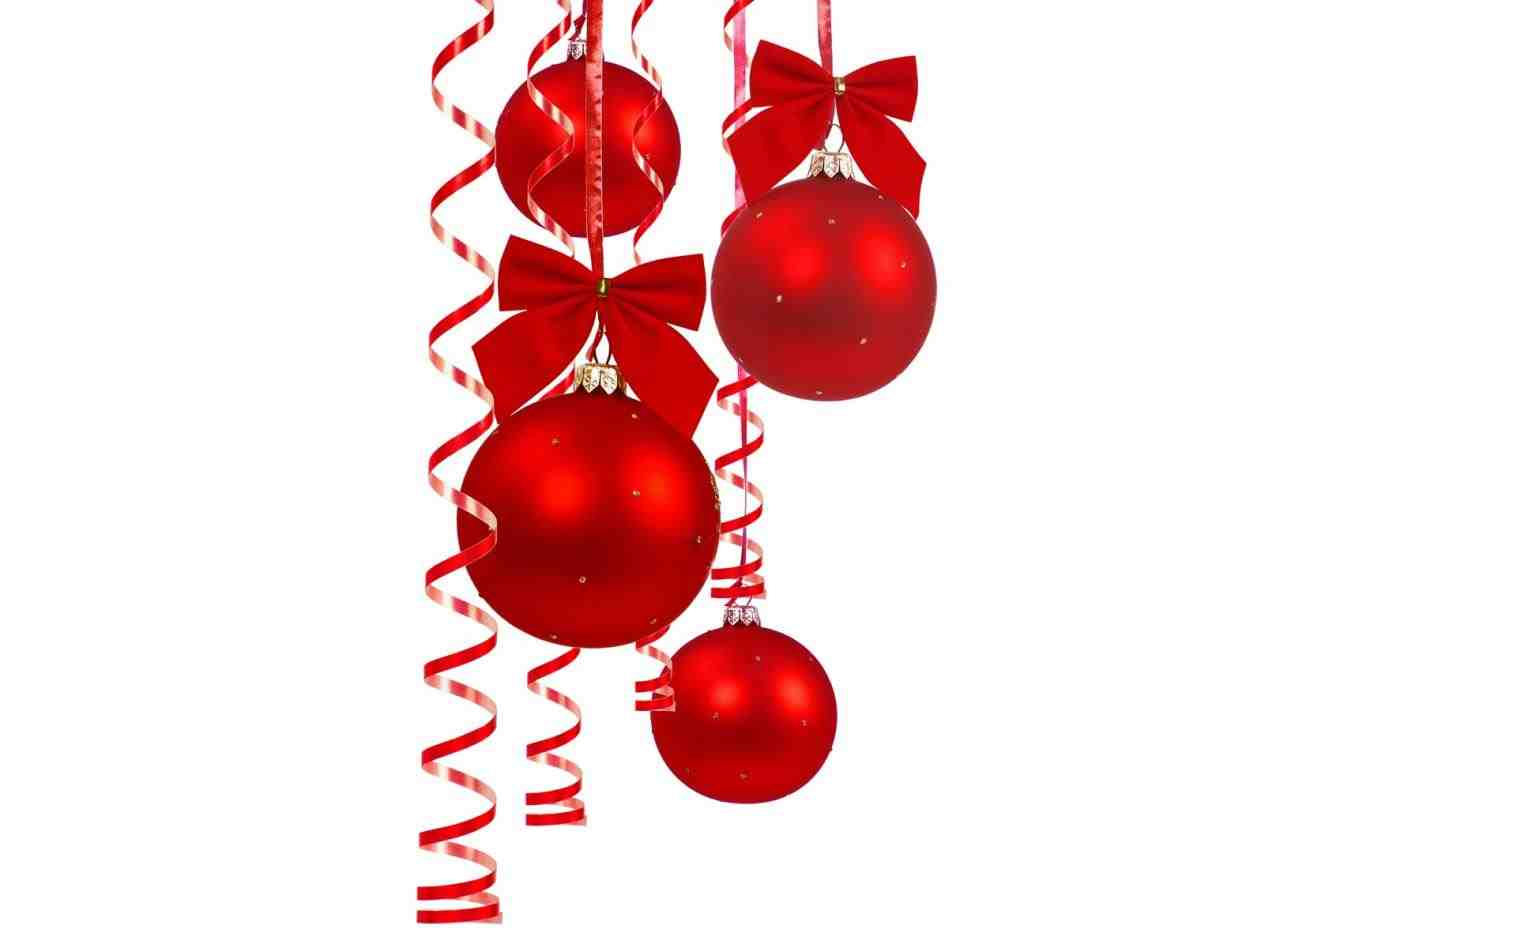 1517x948 Christmas Ornament Border Clip Art Cheminee.website